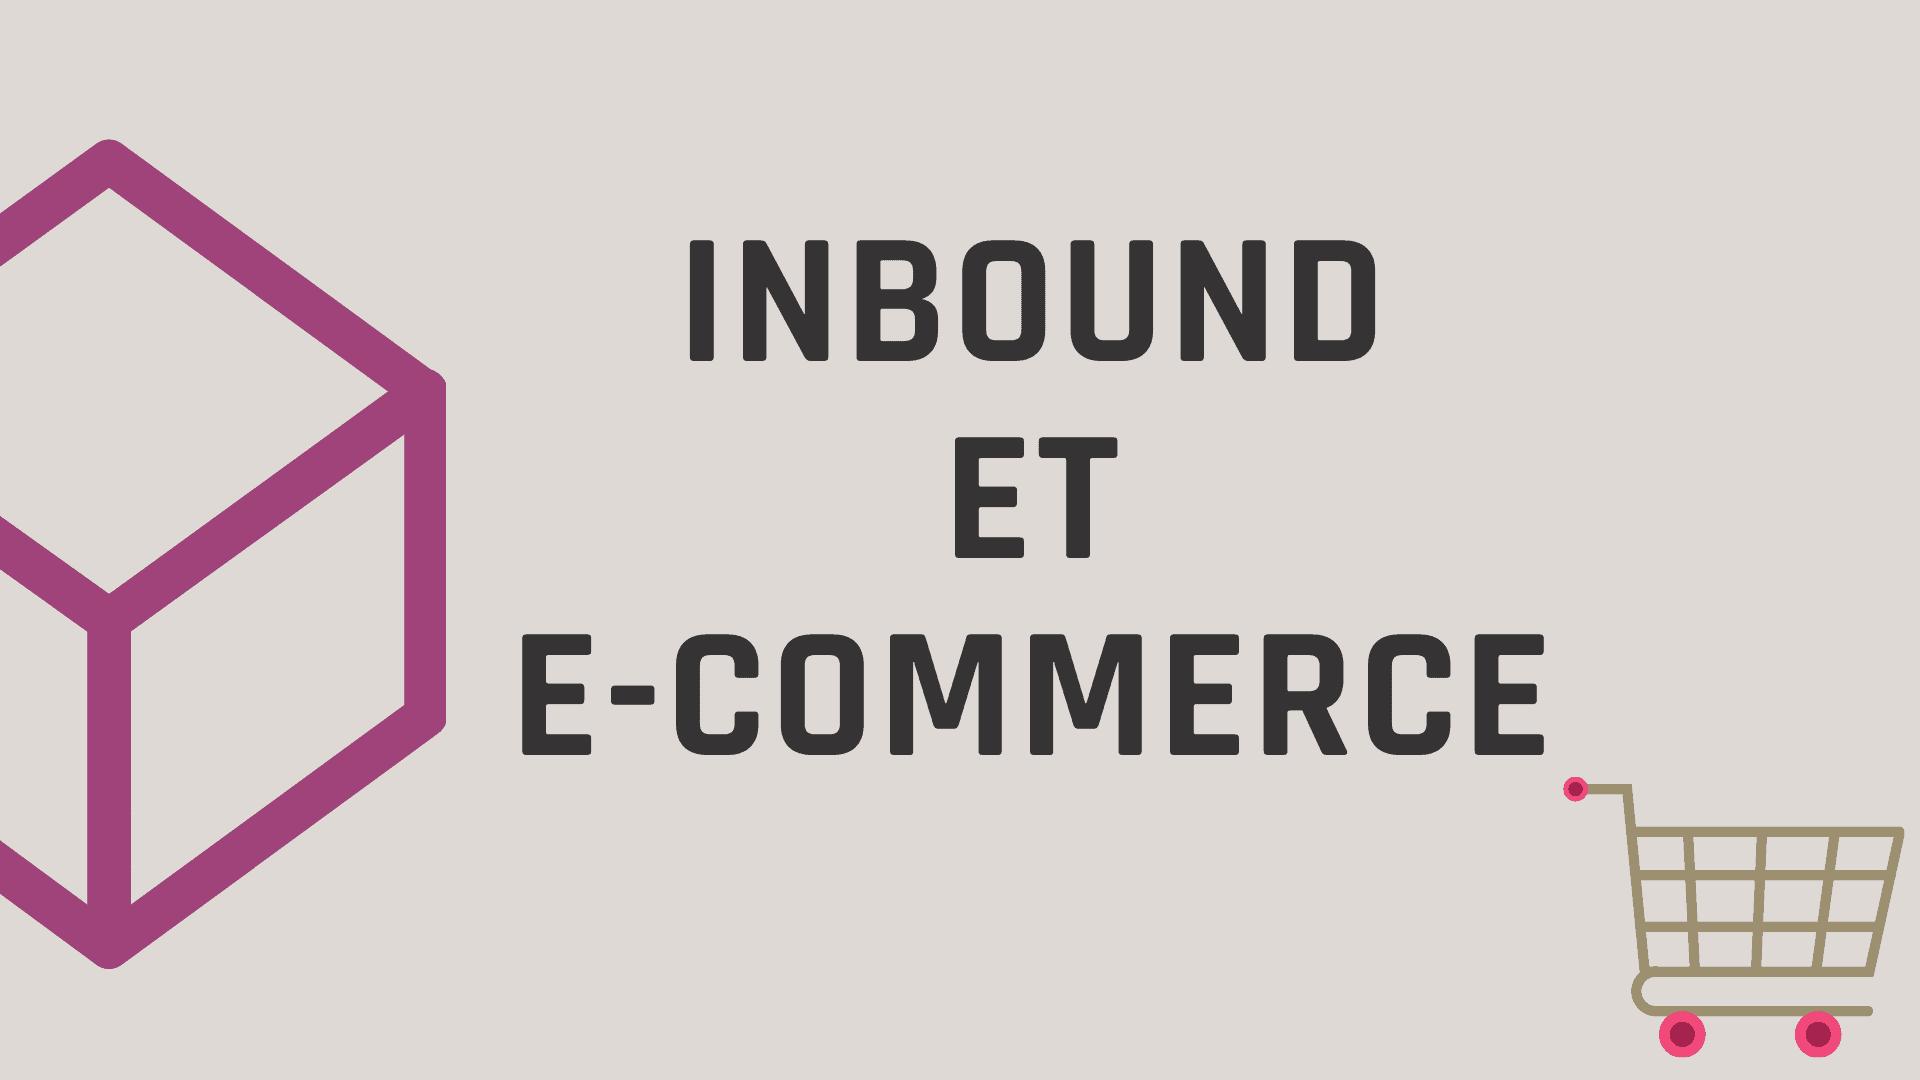 Inbound Ecommerce